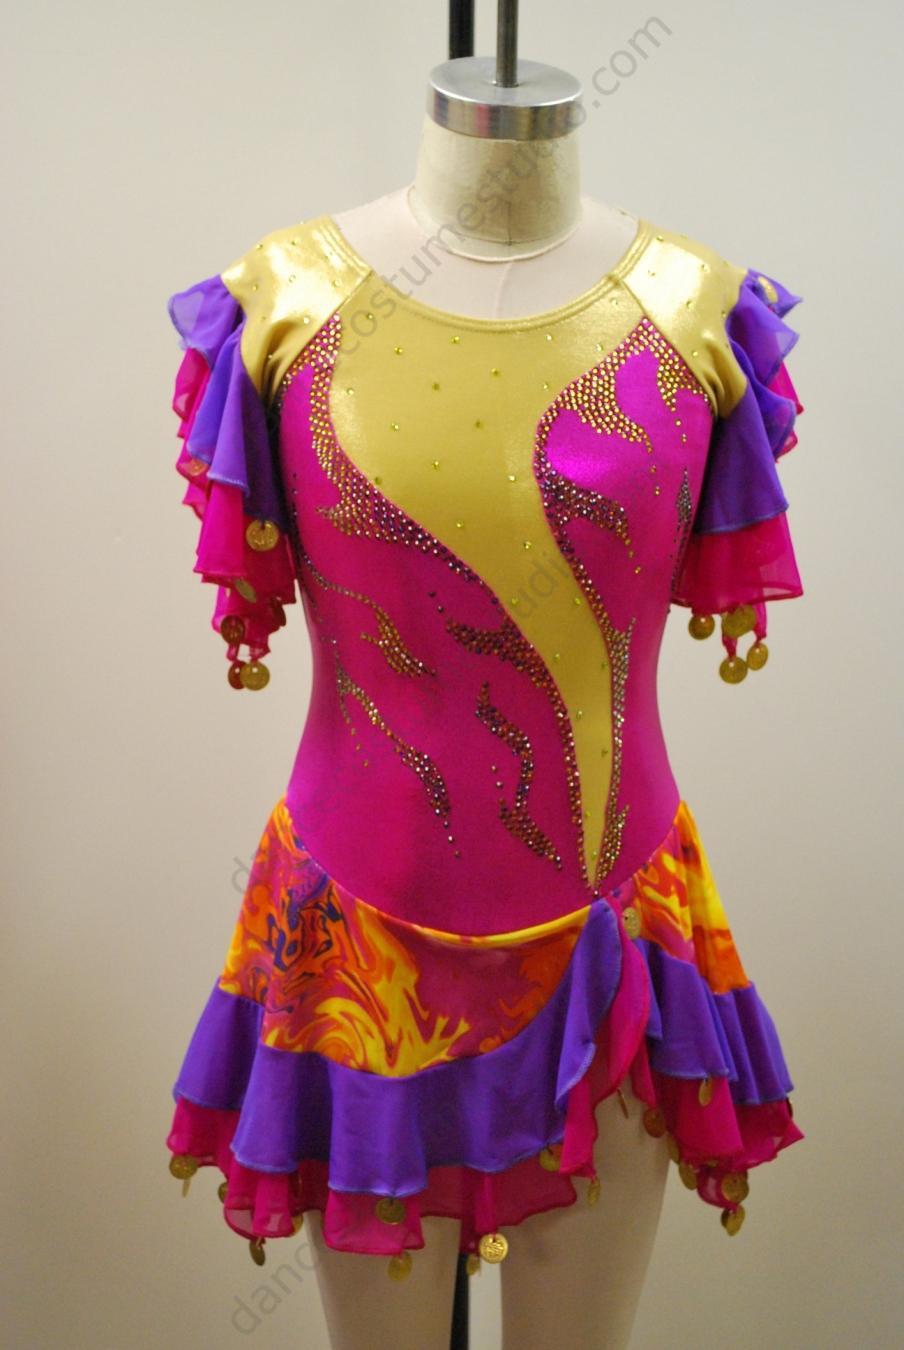 Figure Skating Dresses Performing Outfit Design Studio